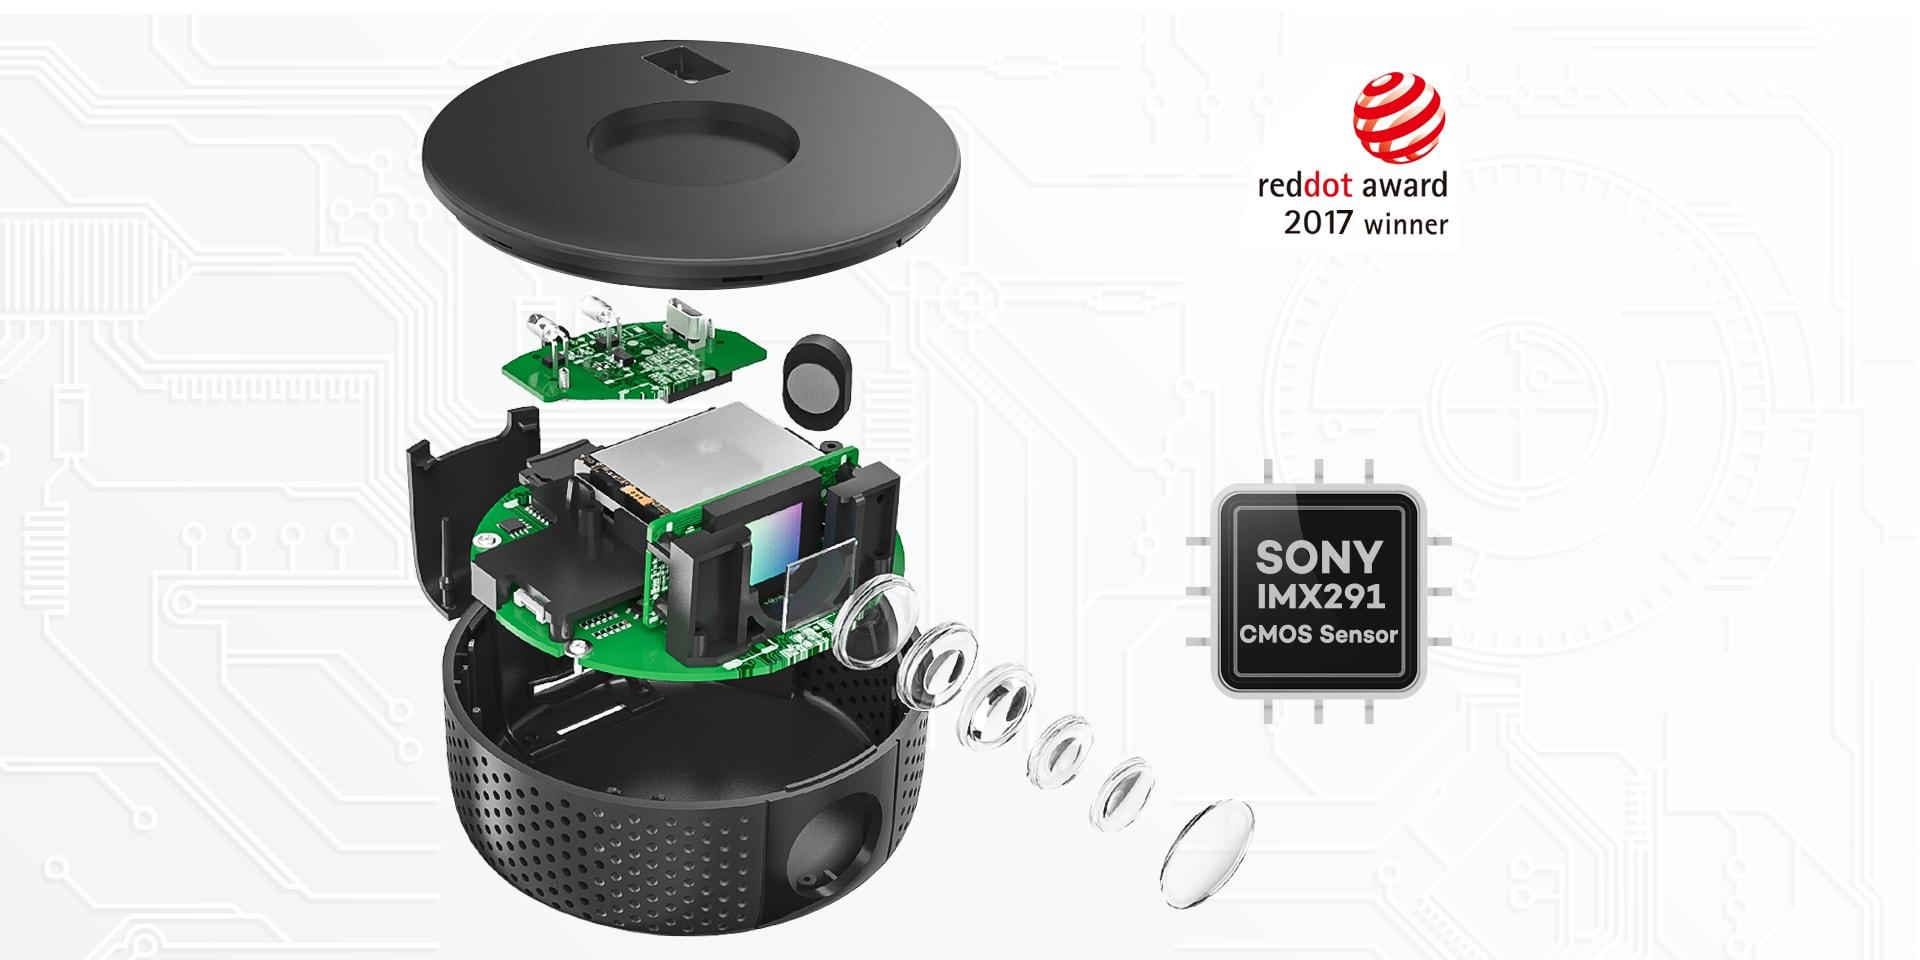 Bộ cảm biến CMOS IMX291 của SONY STARVIS